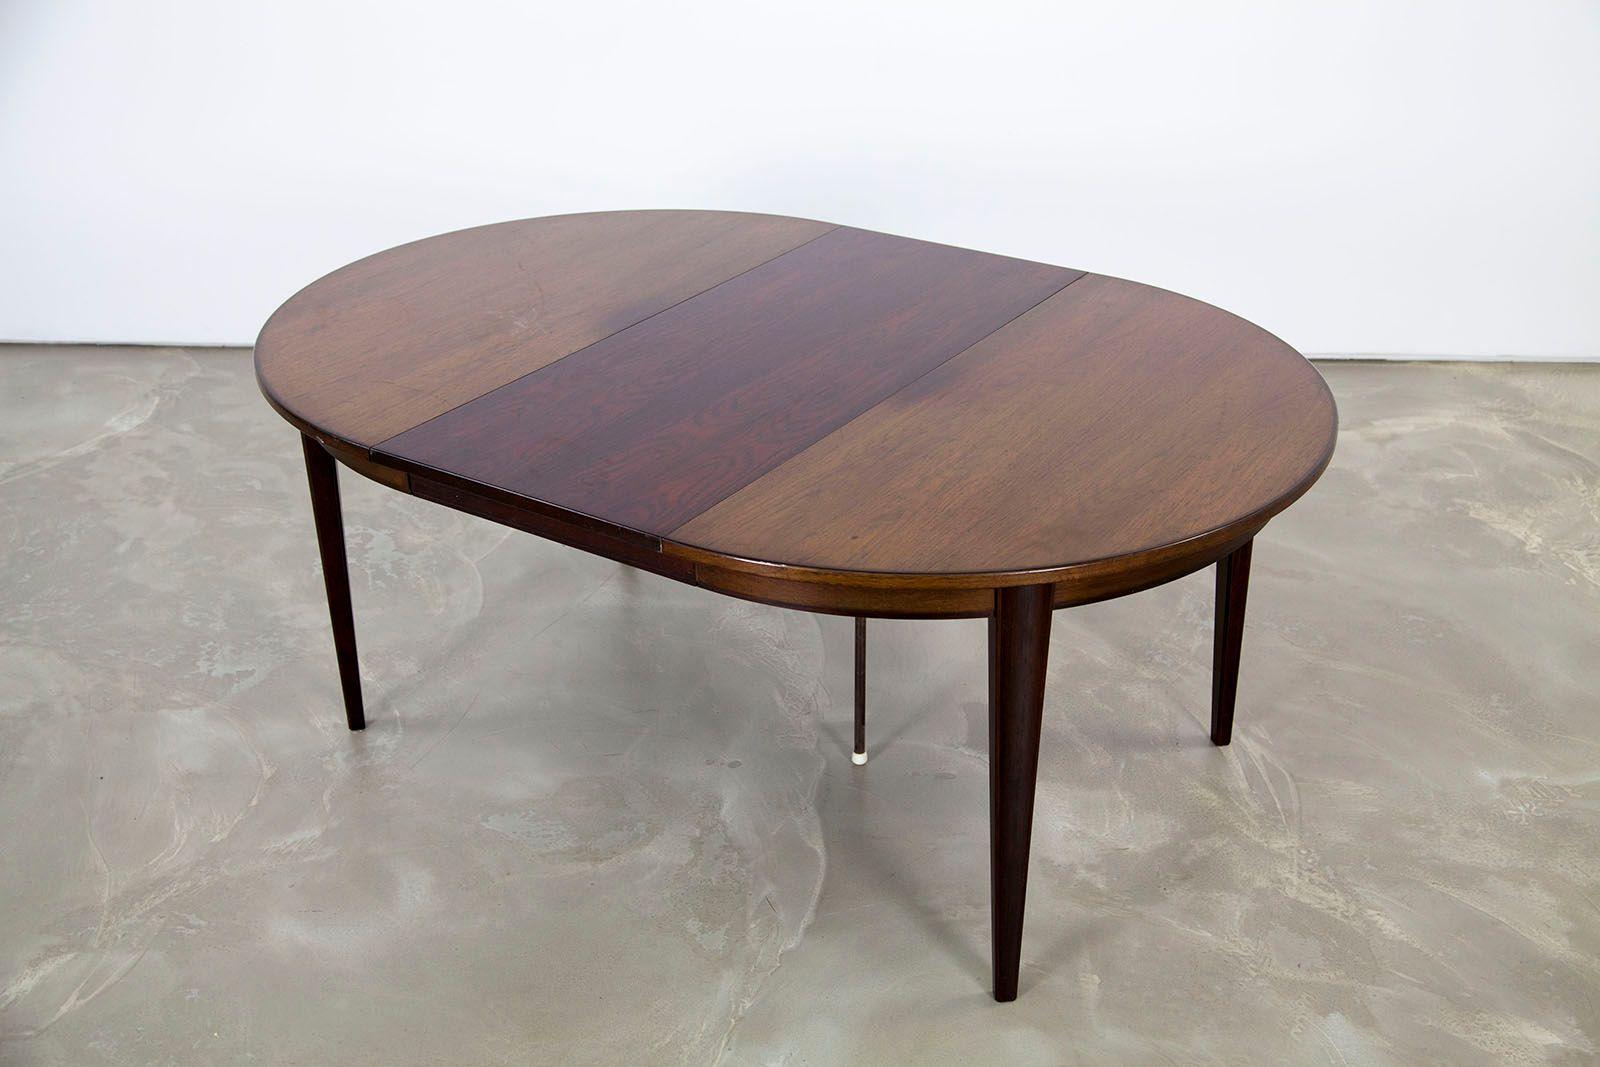 Danish extendable dining table model 55 by omann junior for Tinning table model